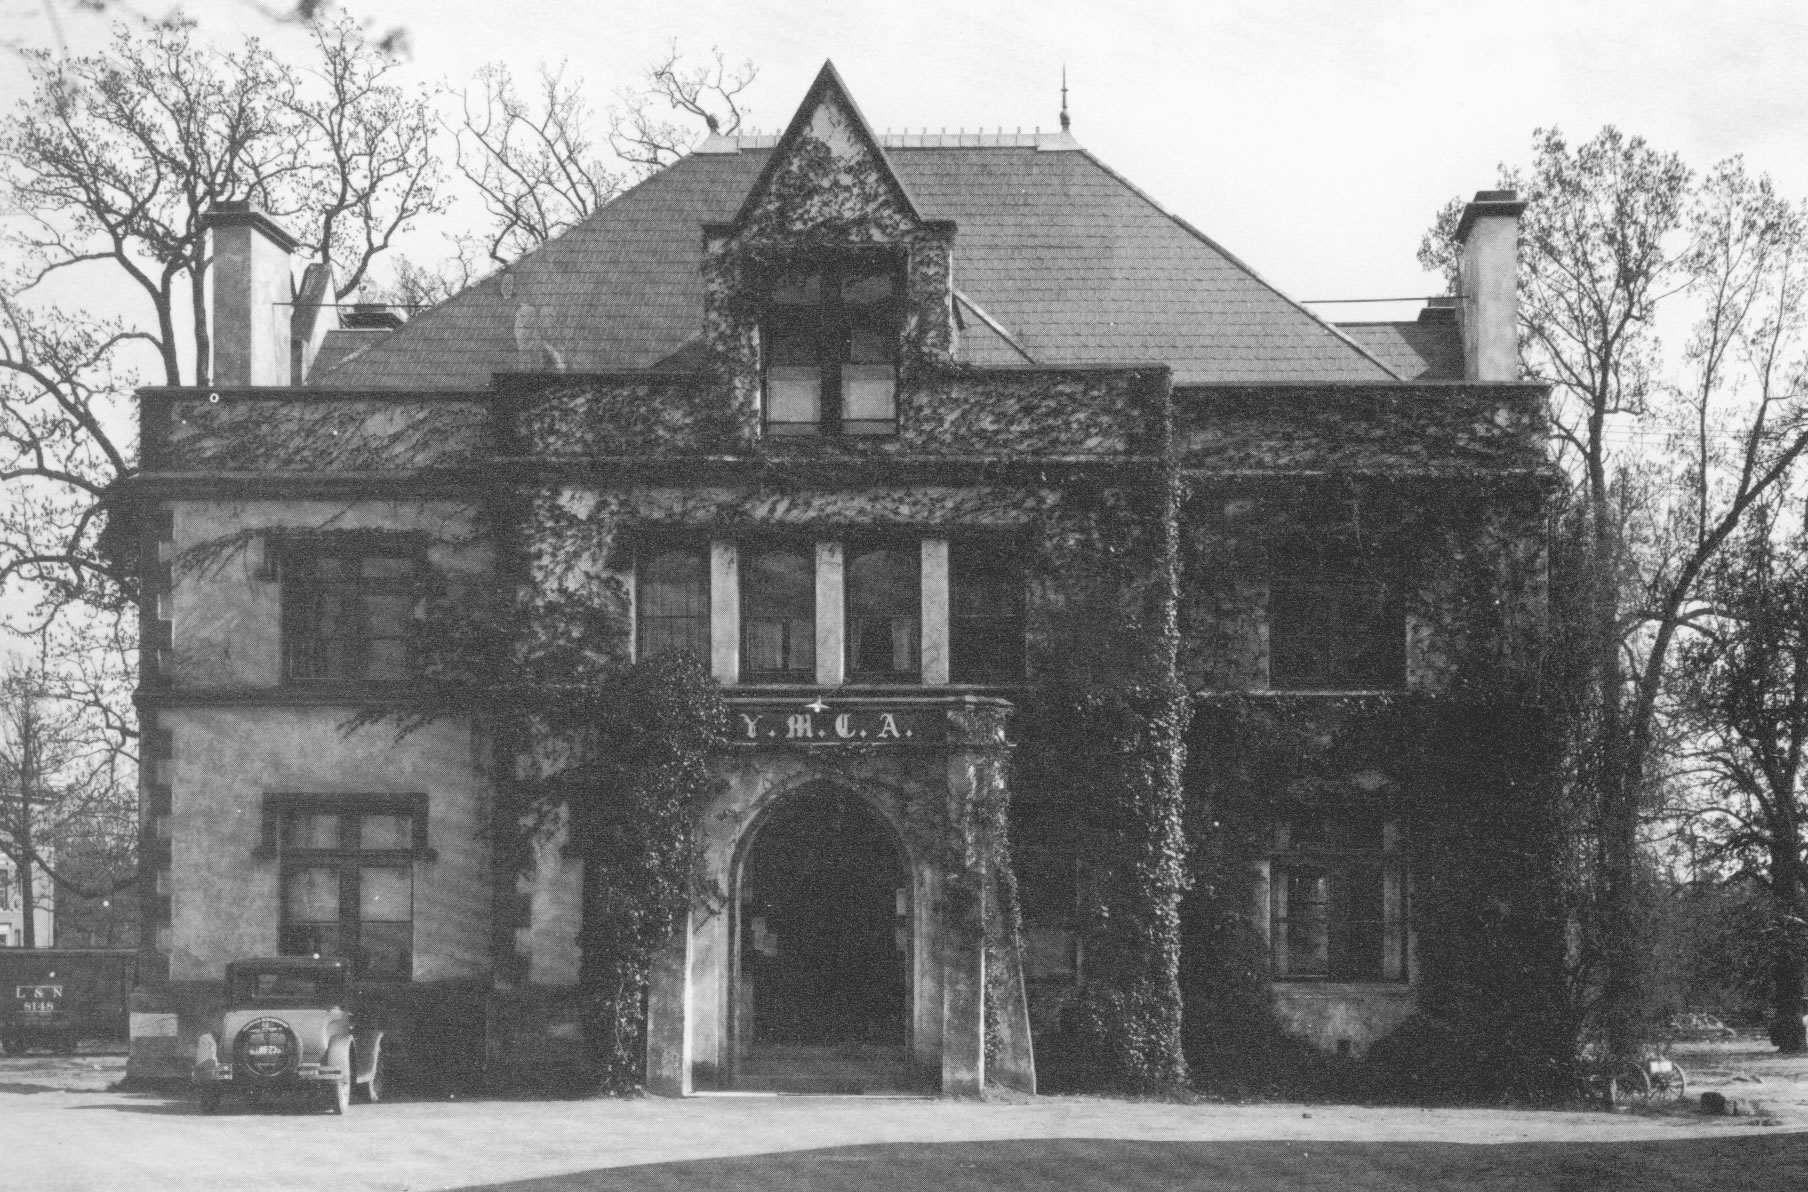 Historical Photo of Campus Y